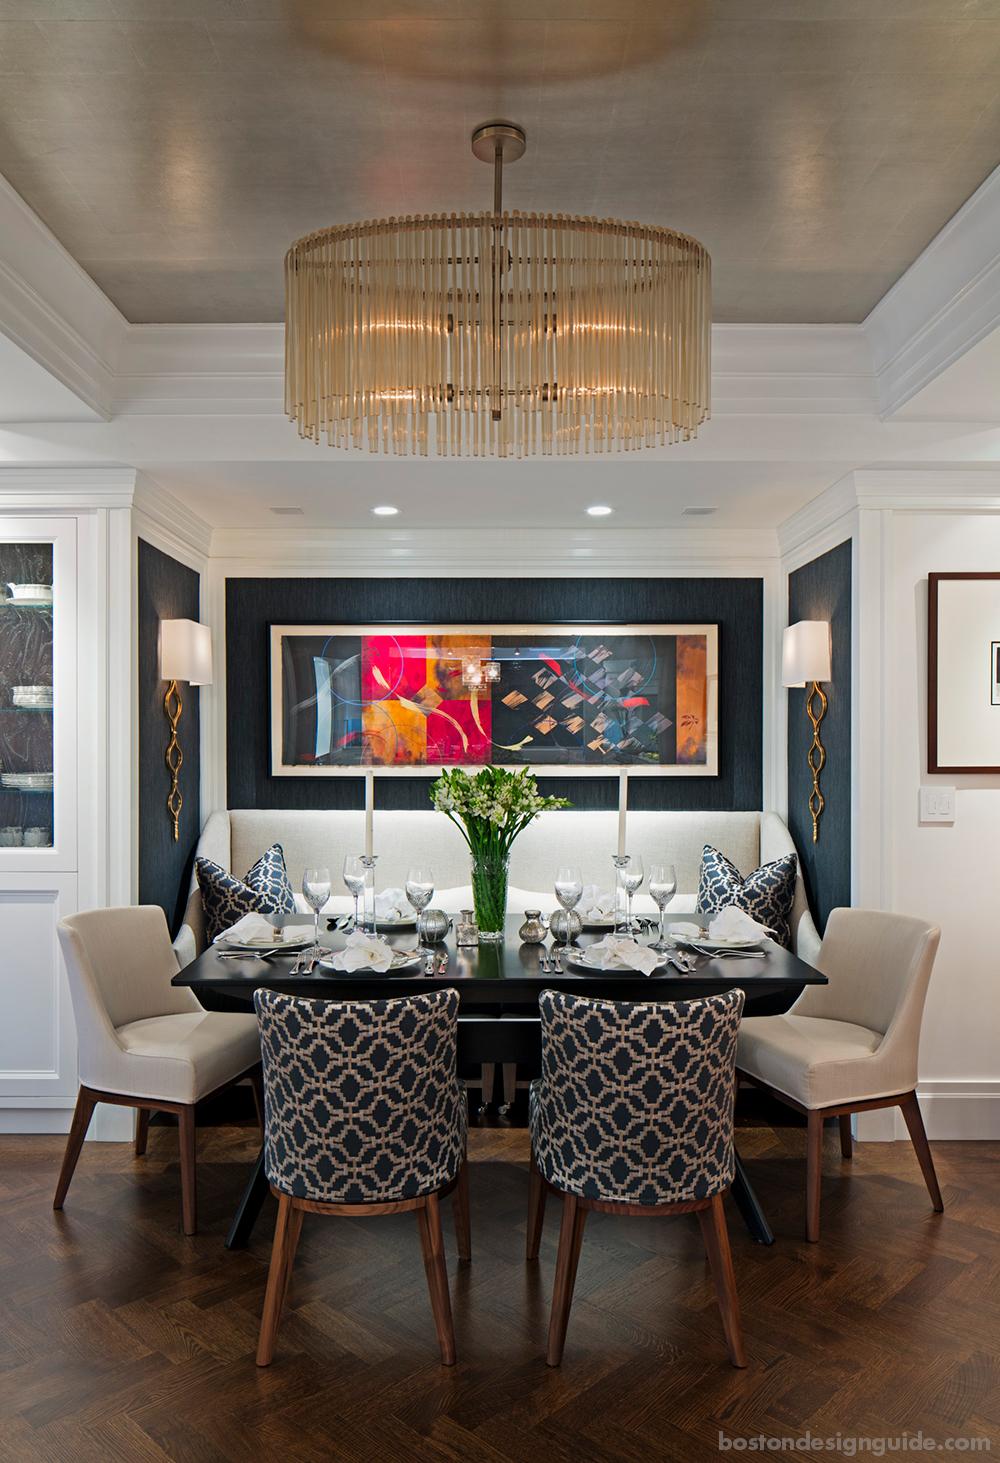 high-end interior design lighting